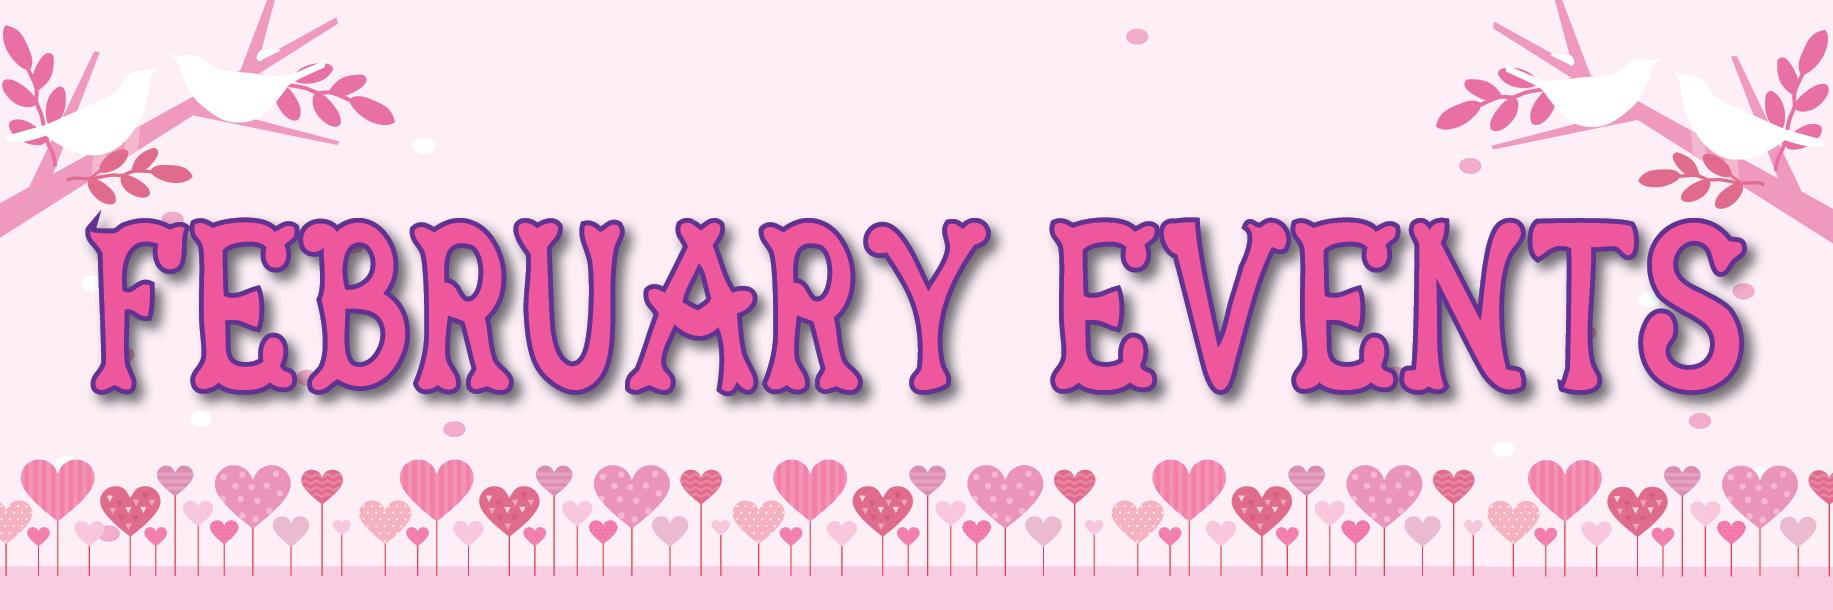 Feb17 Events Slider